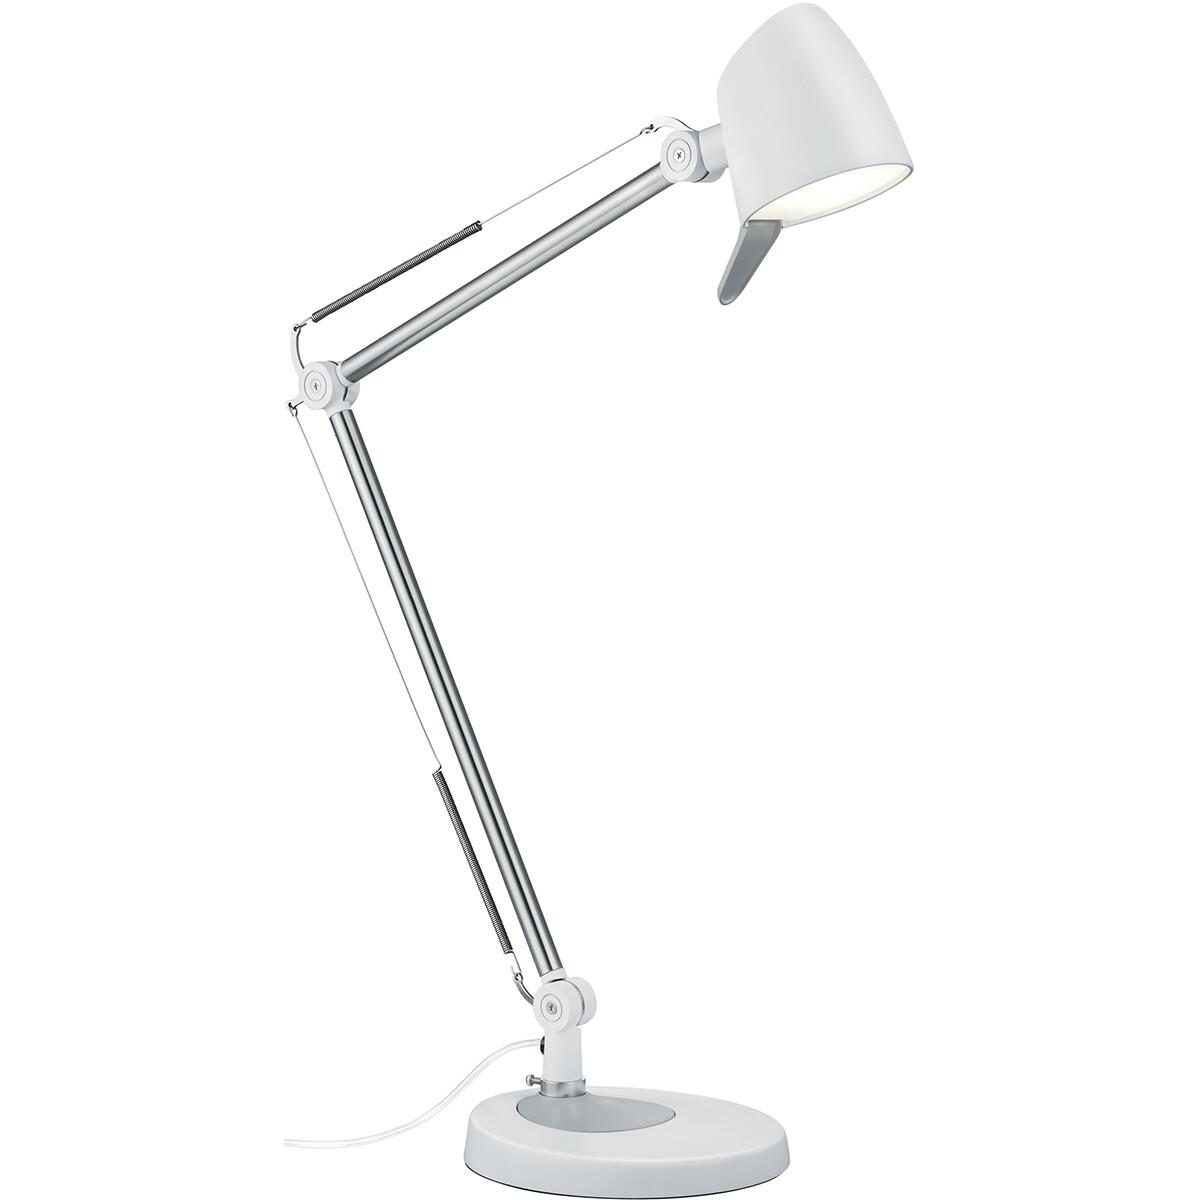 LED Tafellamp - Trion Radino - 5W - Aanpasbare Kleur - Dimbaar - Rond - Mat Wit - Aluminium